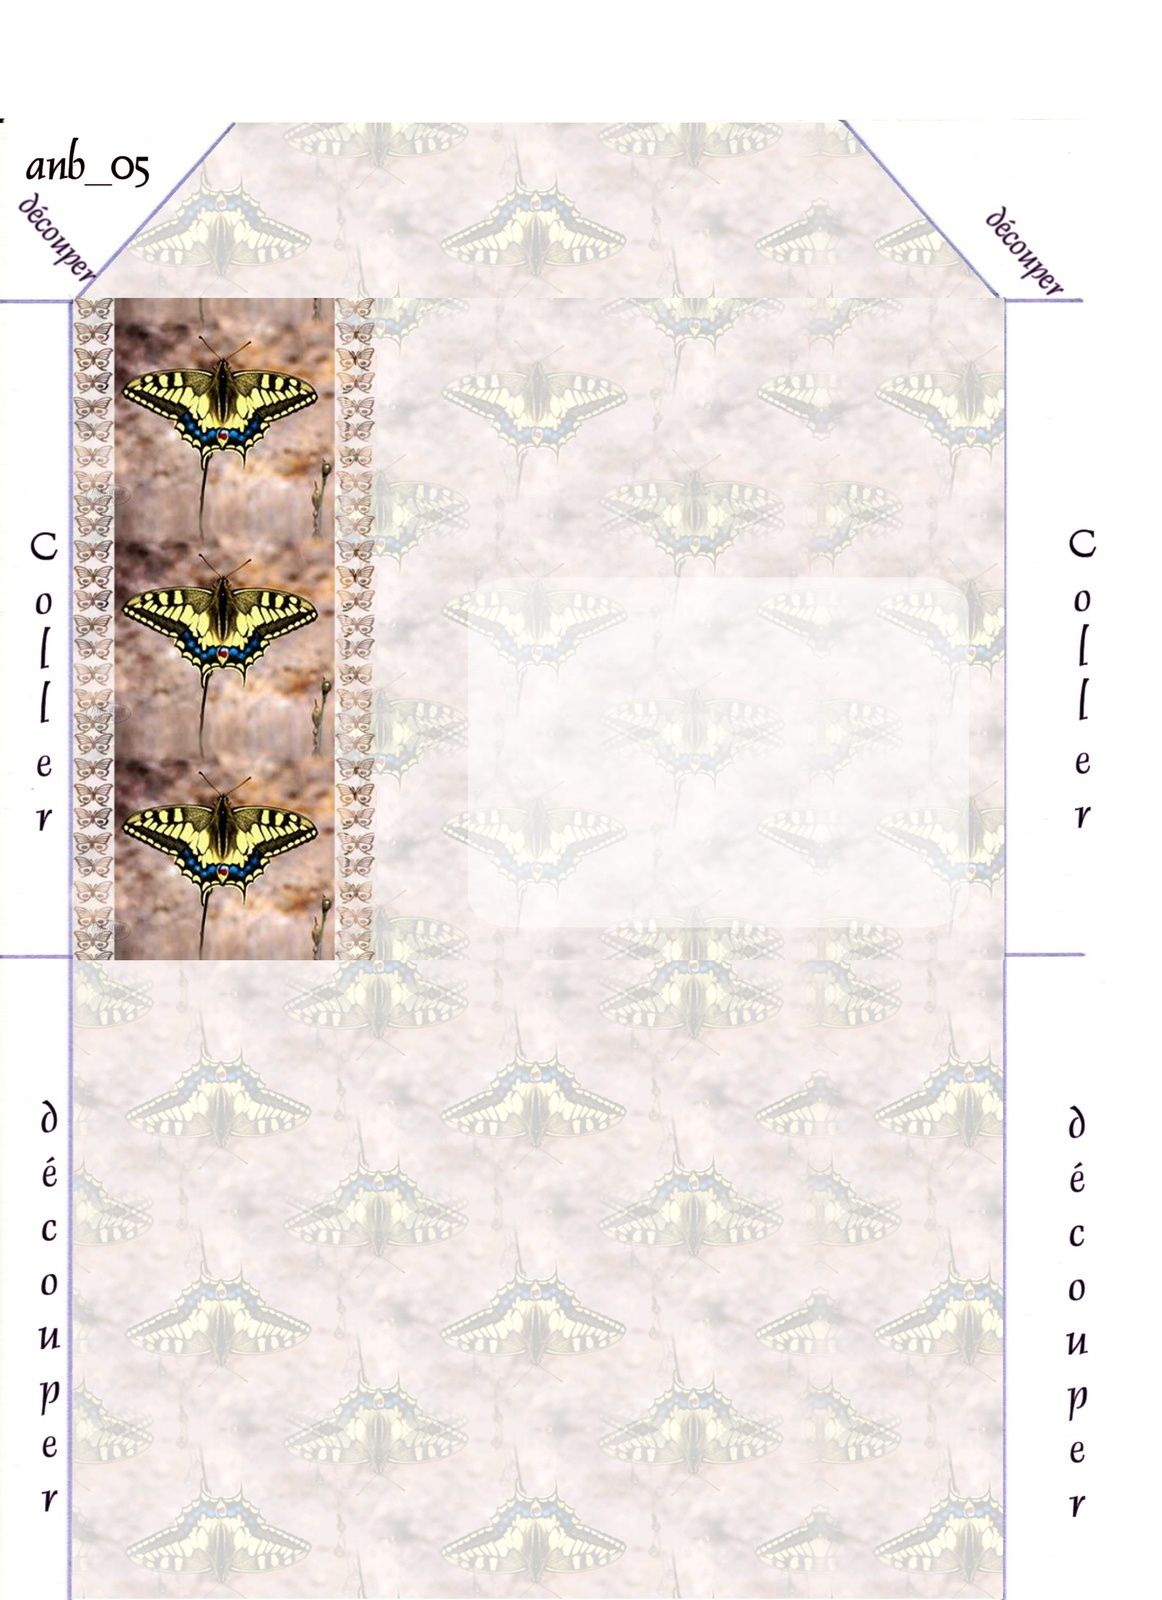 Papillon Incredimail &amp&#x3B; Papier A4 h l &amp&#x3B; outlook &amp&#x3B; enveloppe &amp&#x3B; 2 cartes A5 &amp&#x3B; signets 3 langues     papillon_03_02_p_saharae_anb_bordermask002